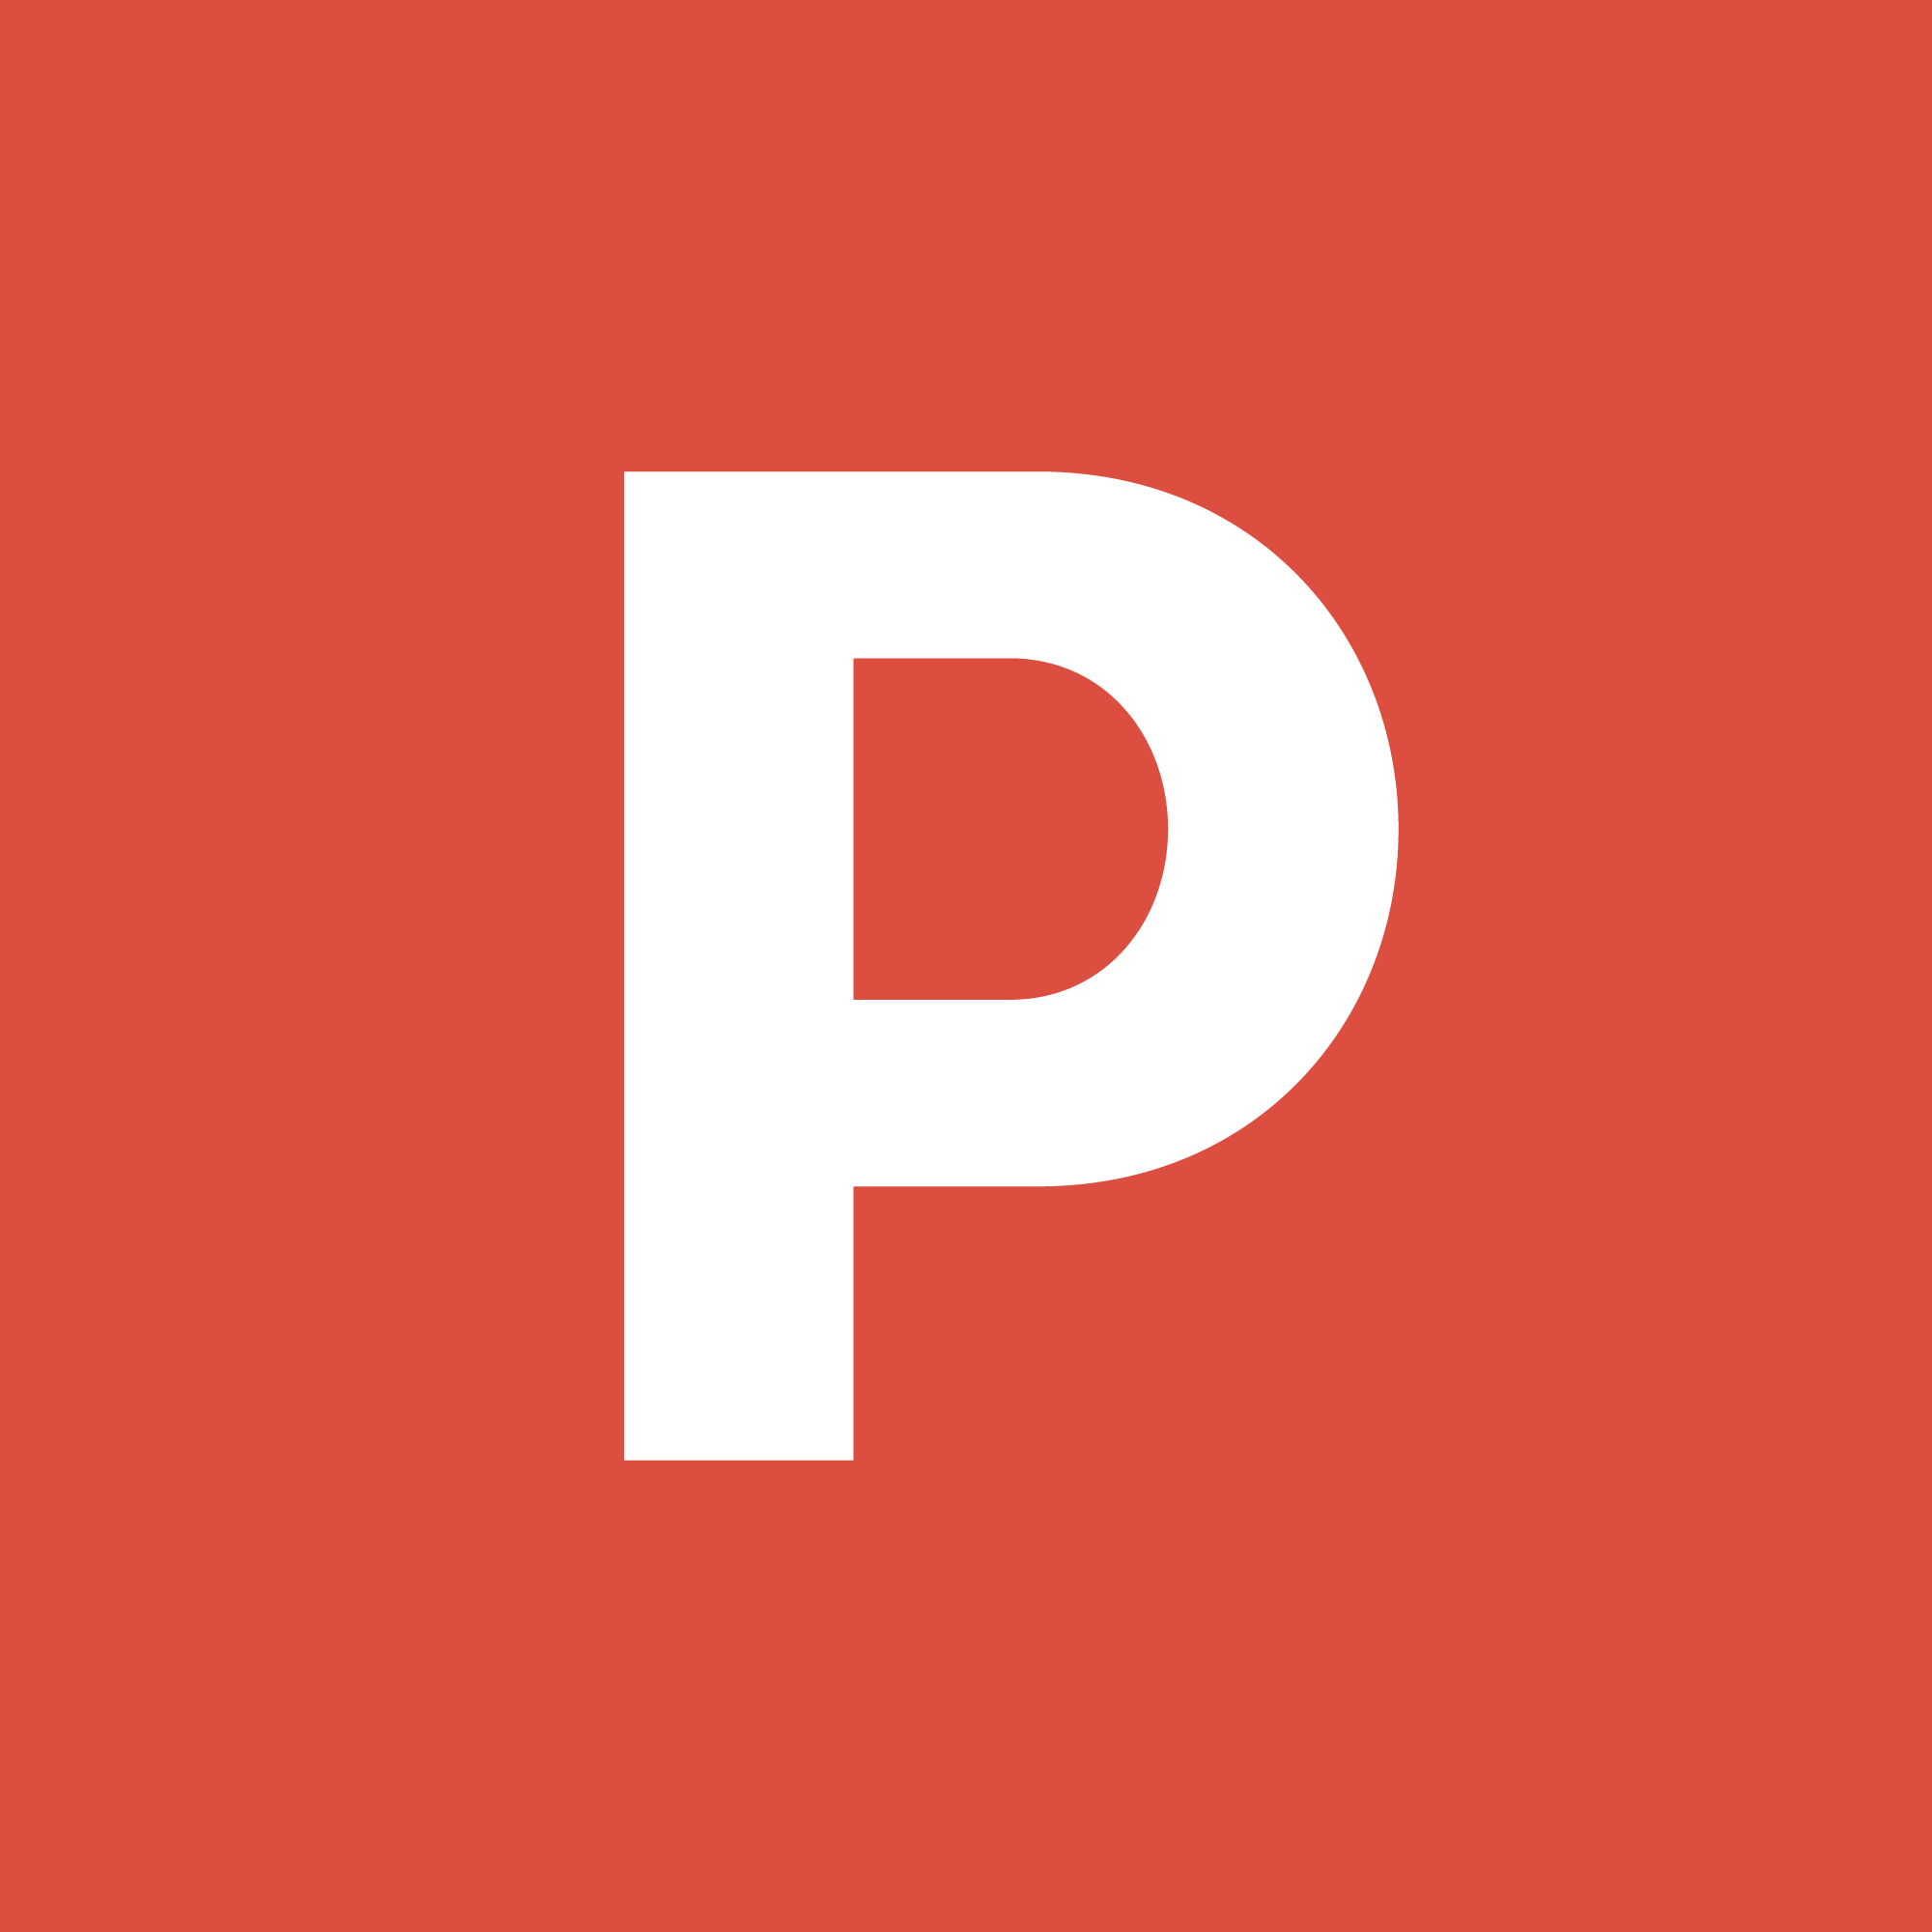 Logo Protagonist